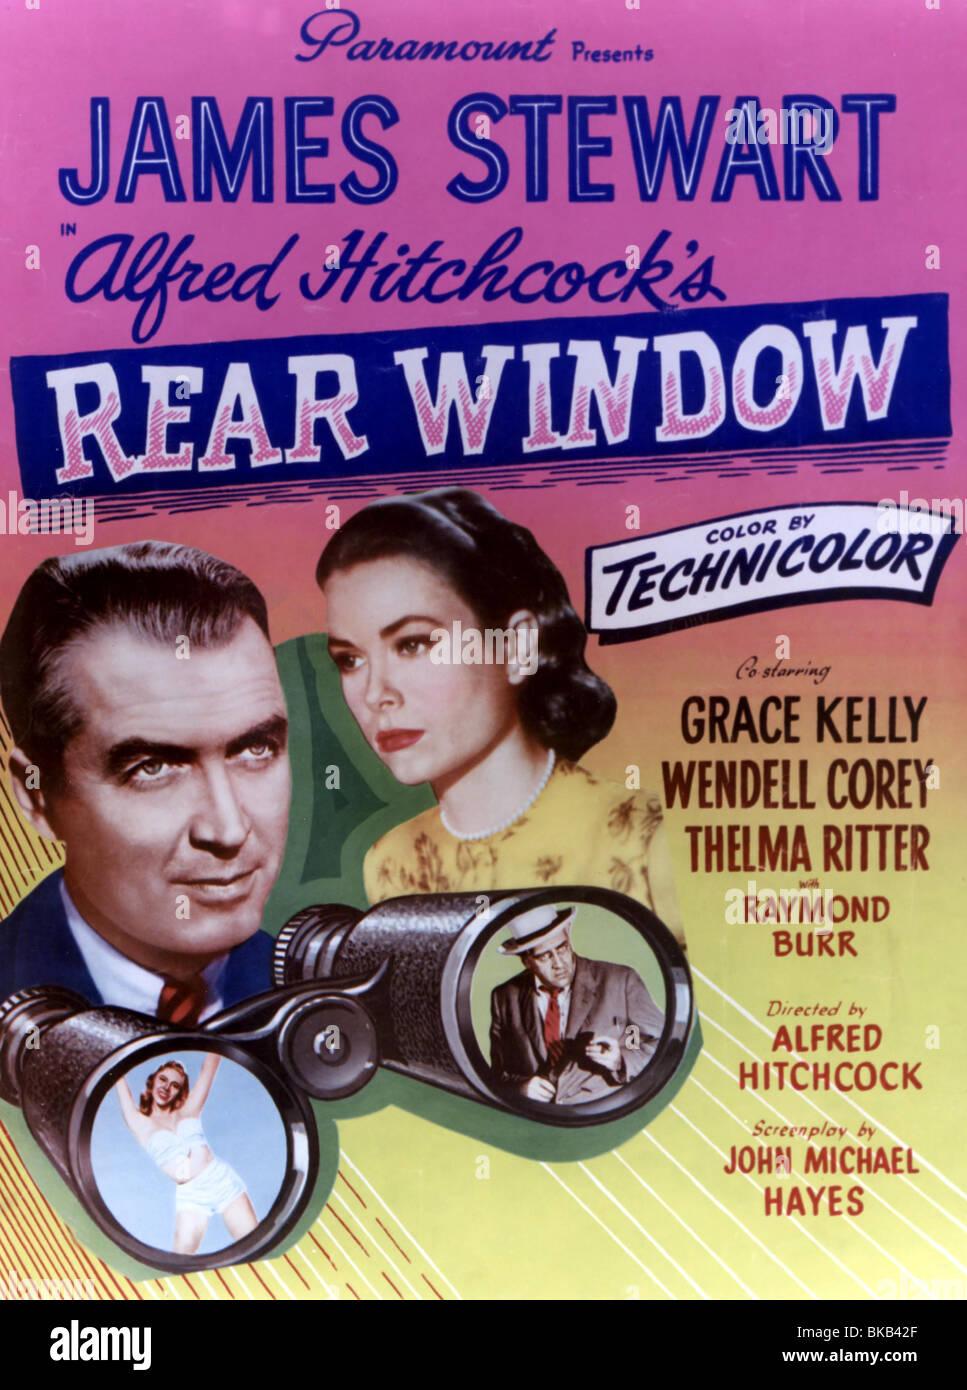 REAR WINDOW (1954) JAMES STEWART, GRACE KELLY POSTER RRW 002CP - Stock Image